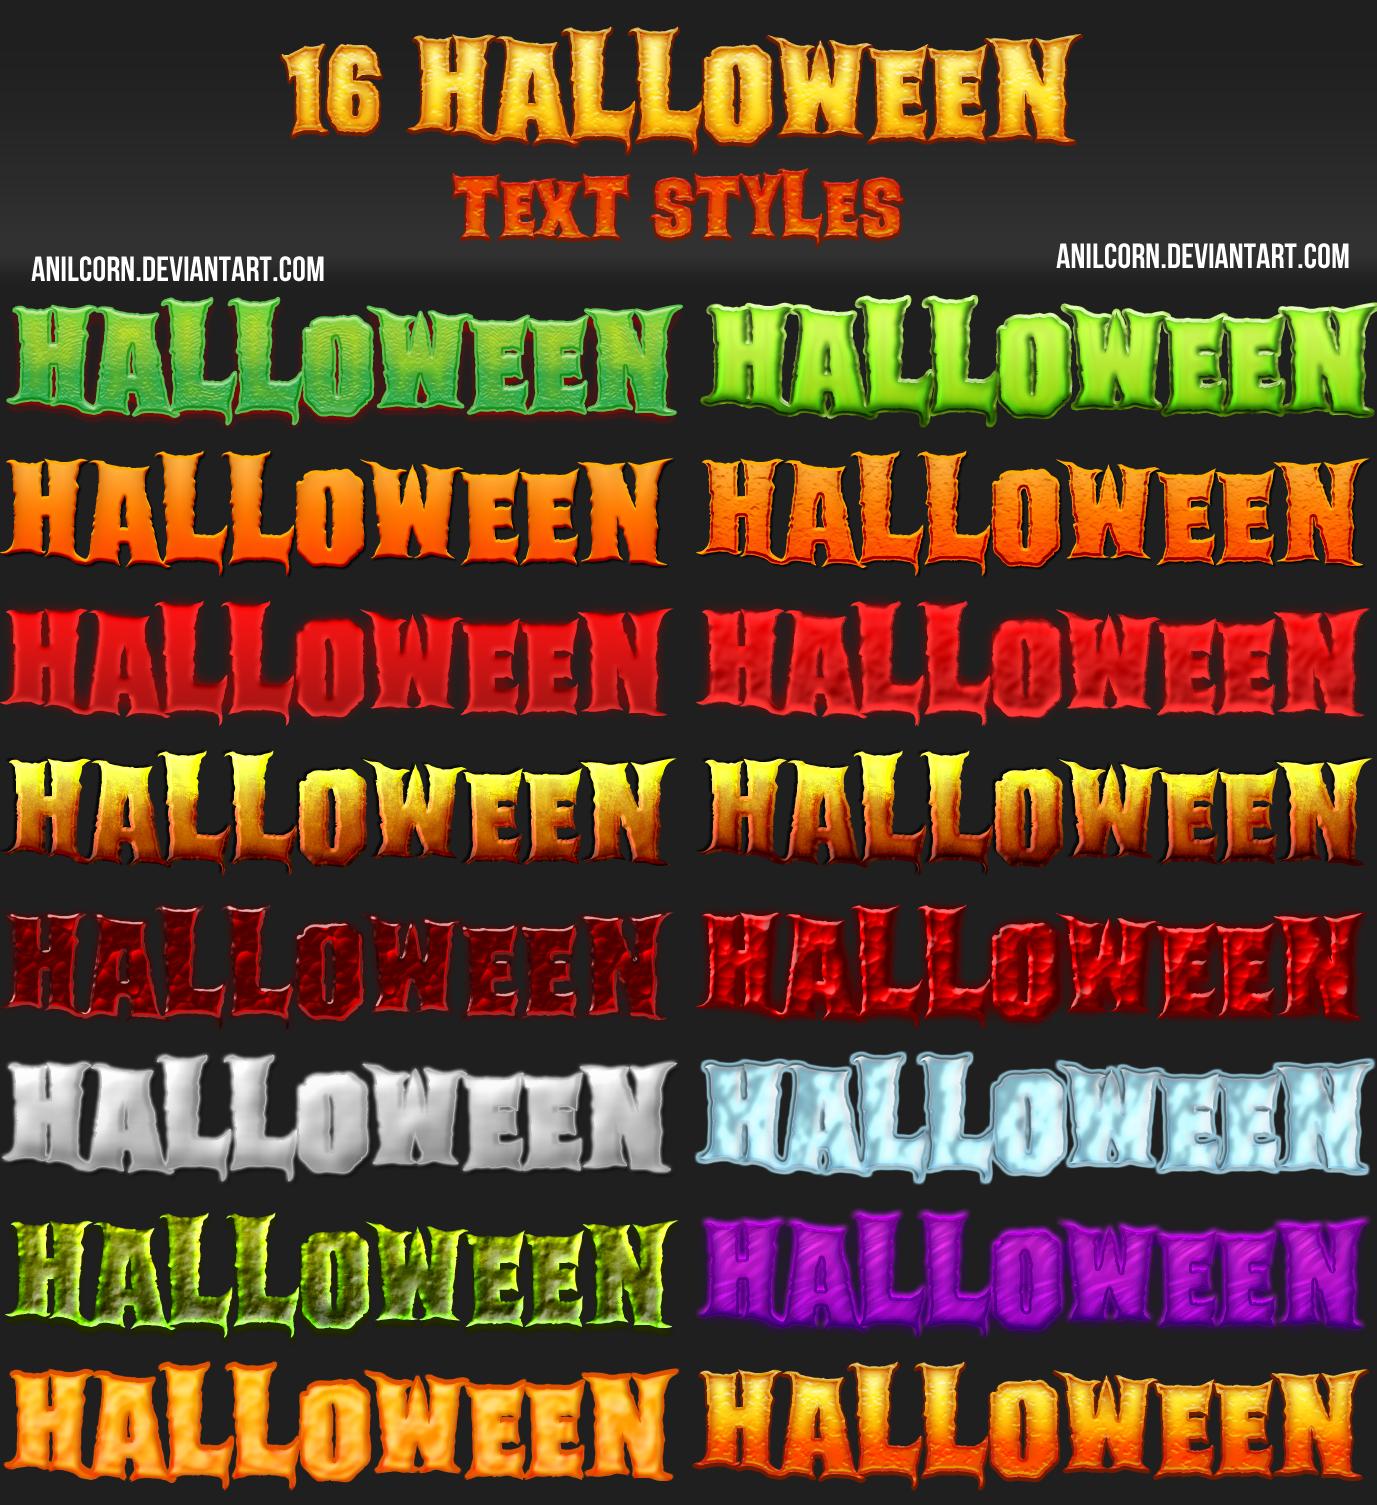 16 Halloween Text Styles by AnilCorn